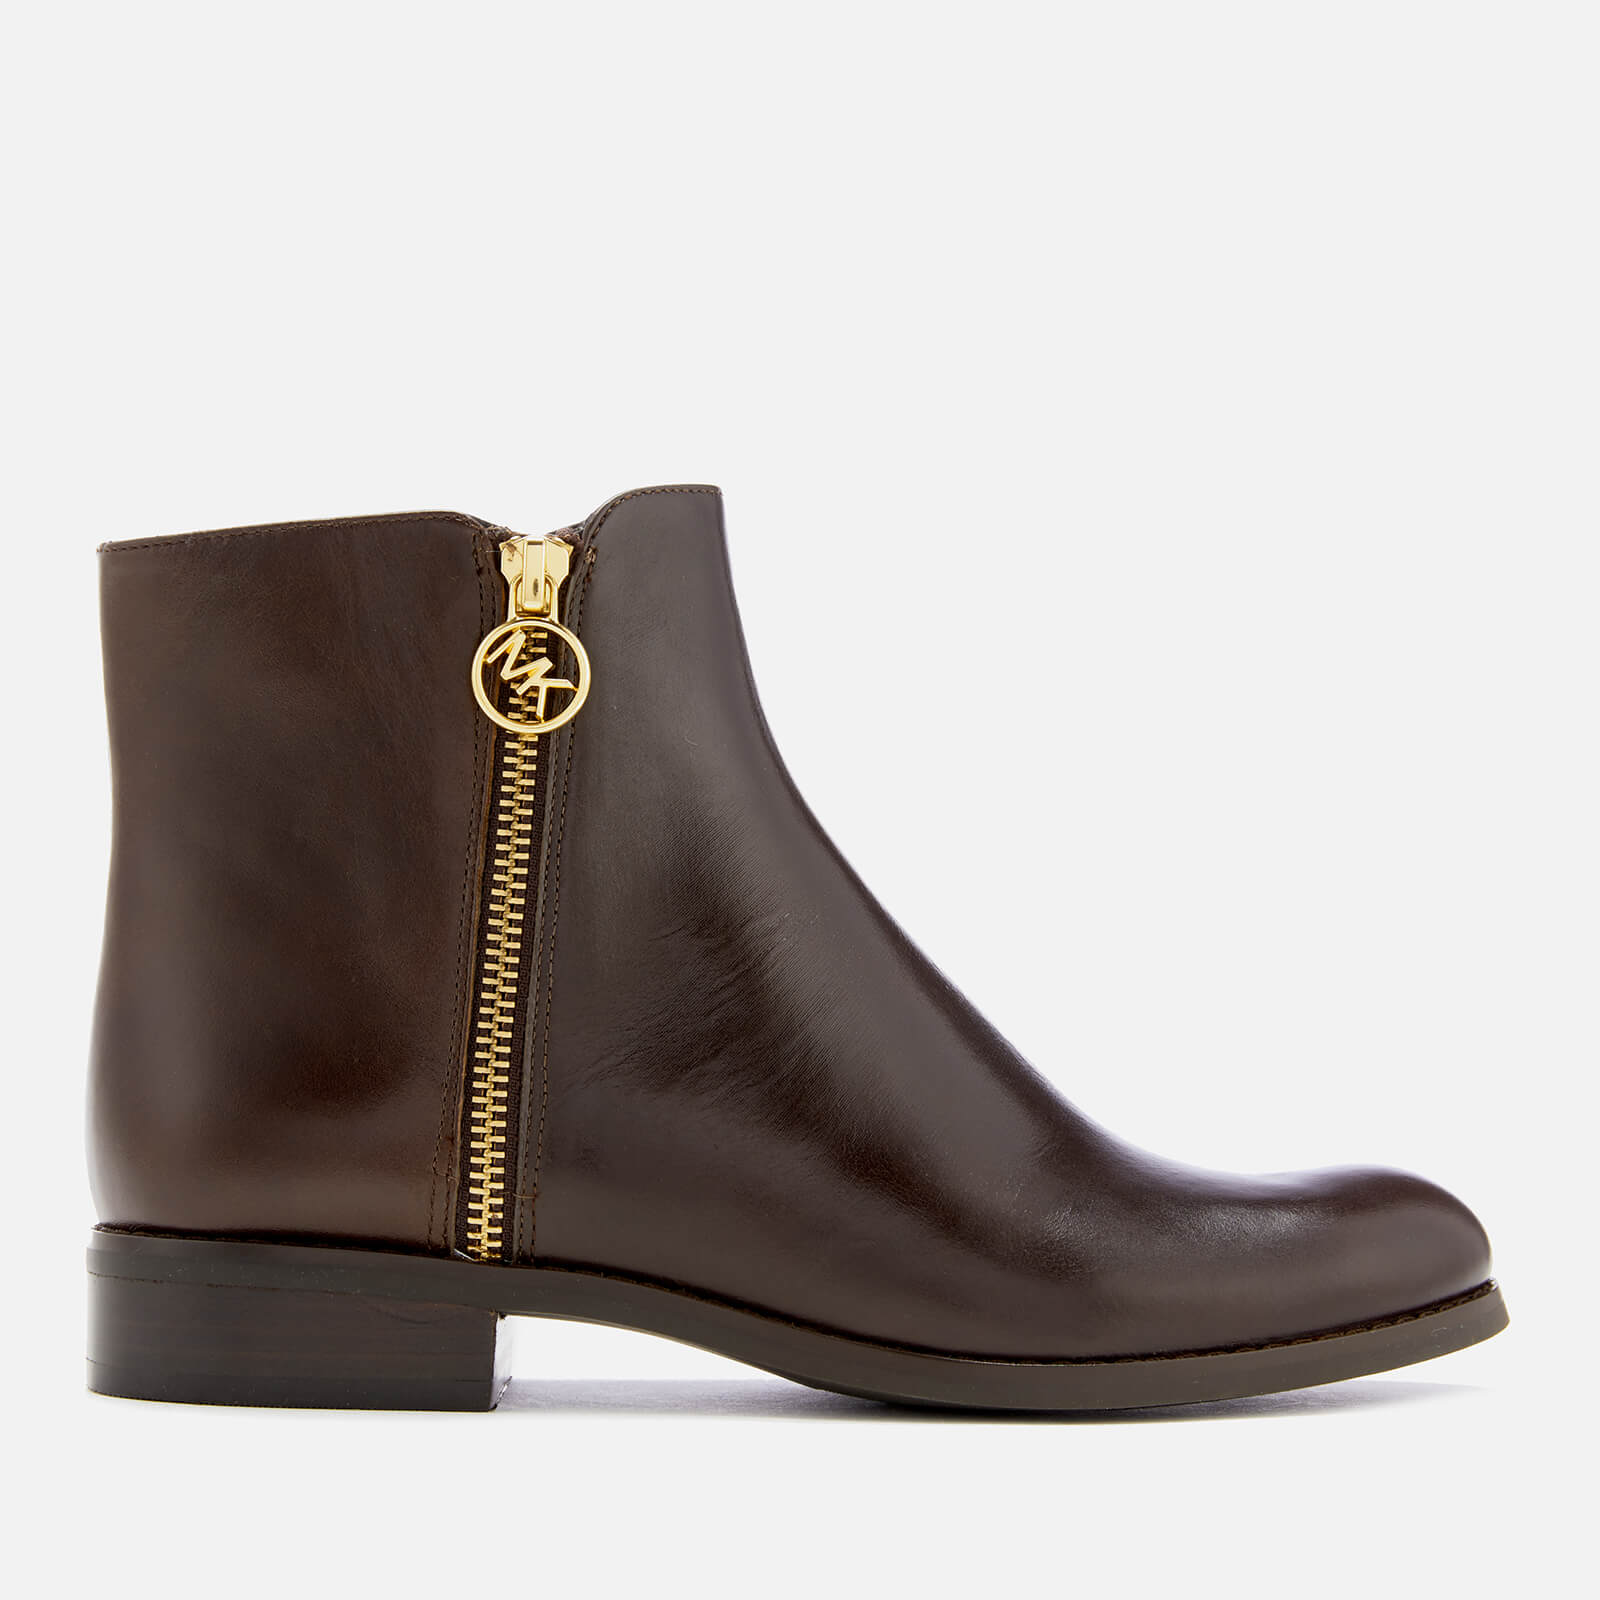 6607bd192833 MICHAEL MICHAEL KORS Women s Jaycie Flat Ankle Boots - Nutmeg Clothing